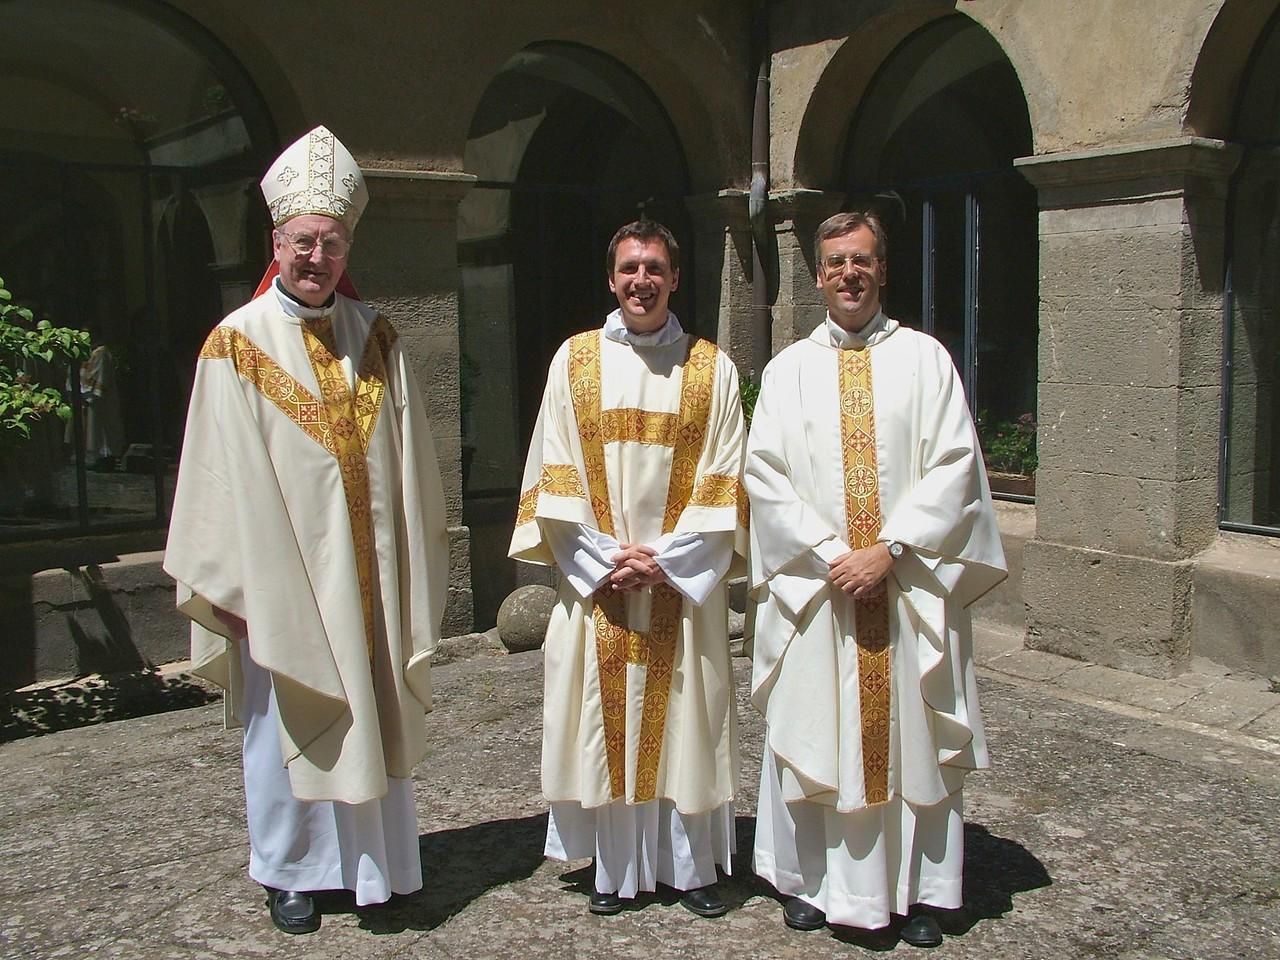 Bishop Brain, John and the Rector